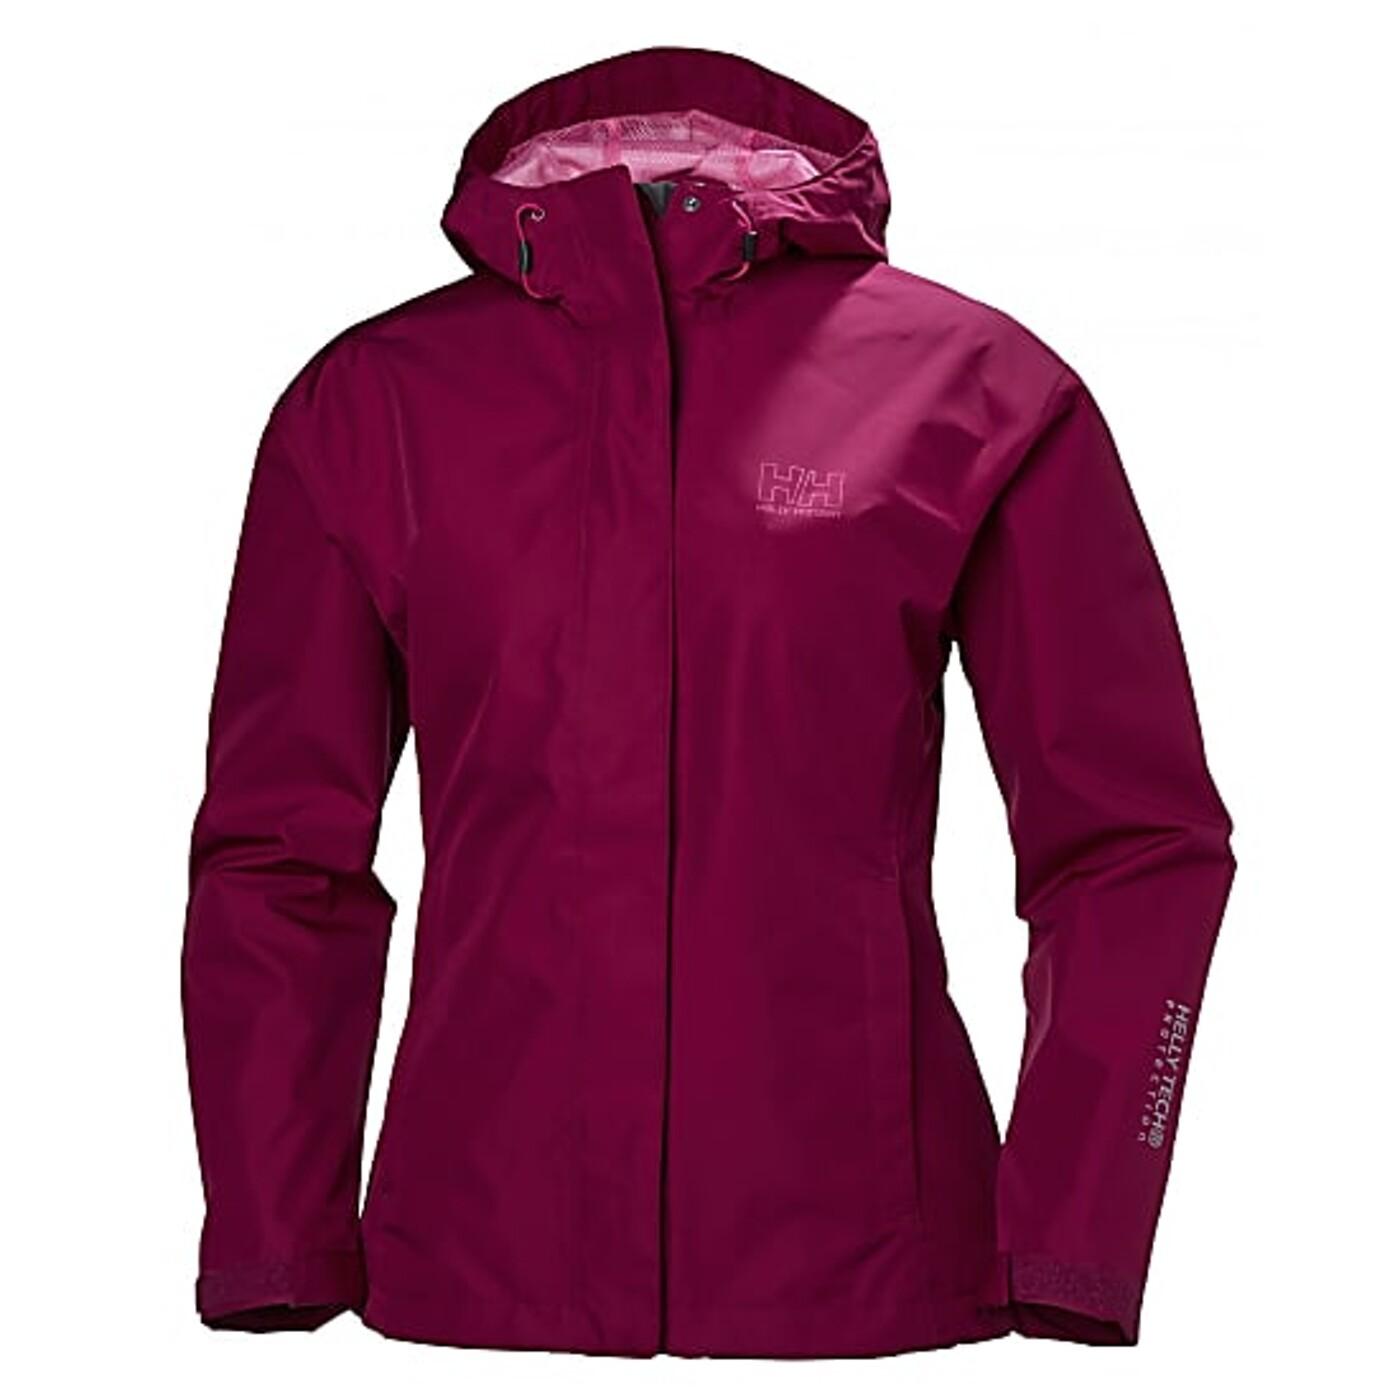 Funktionsjacke Aconcagua Light ML Jacket Mammut - Damen